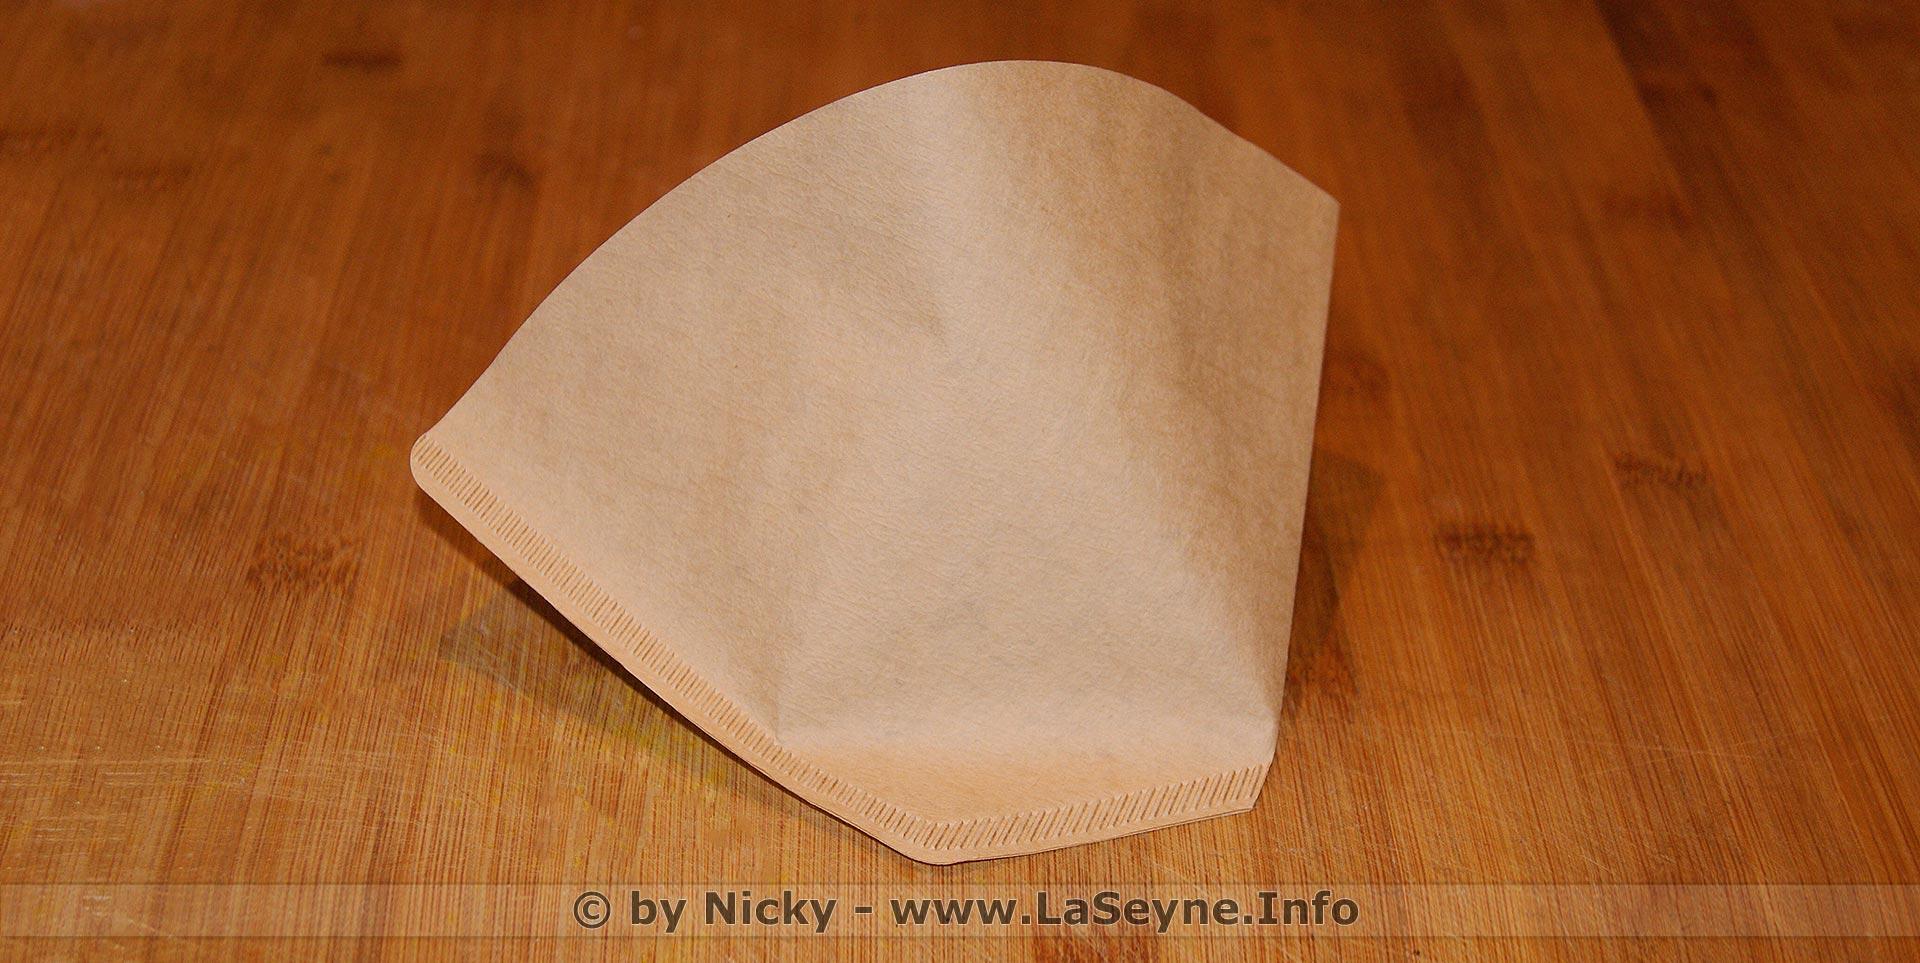 Covid19: Euh non, les Filtres à Café ne peuvent pas servir de Masque